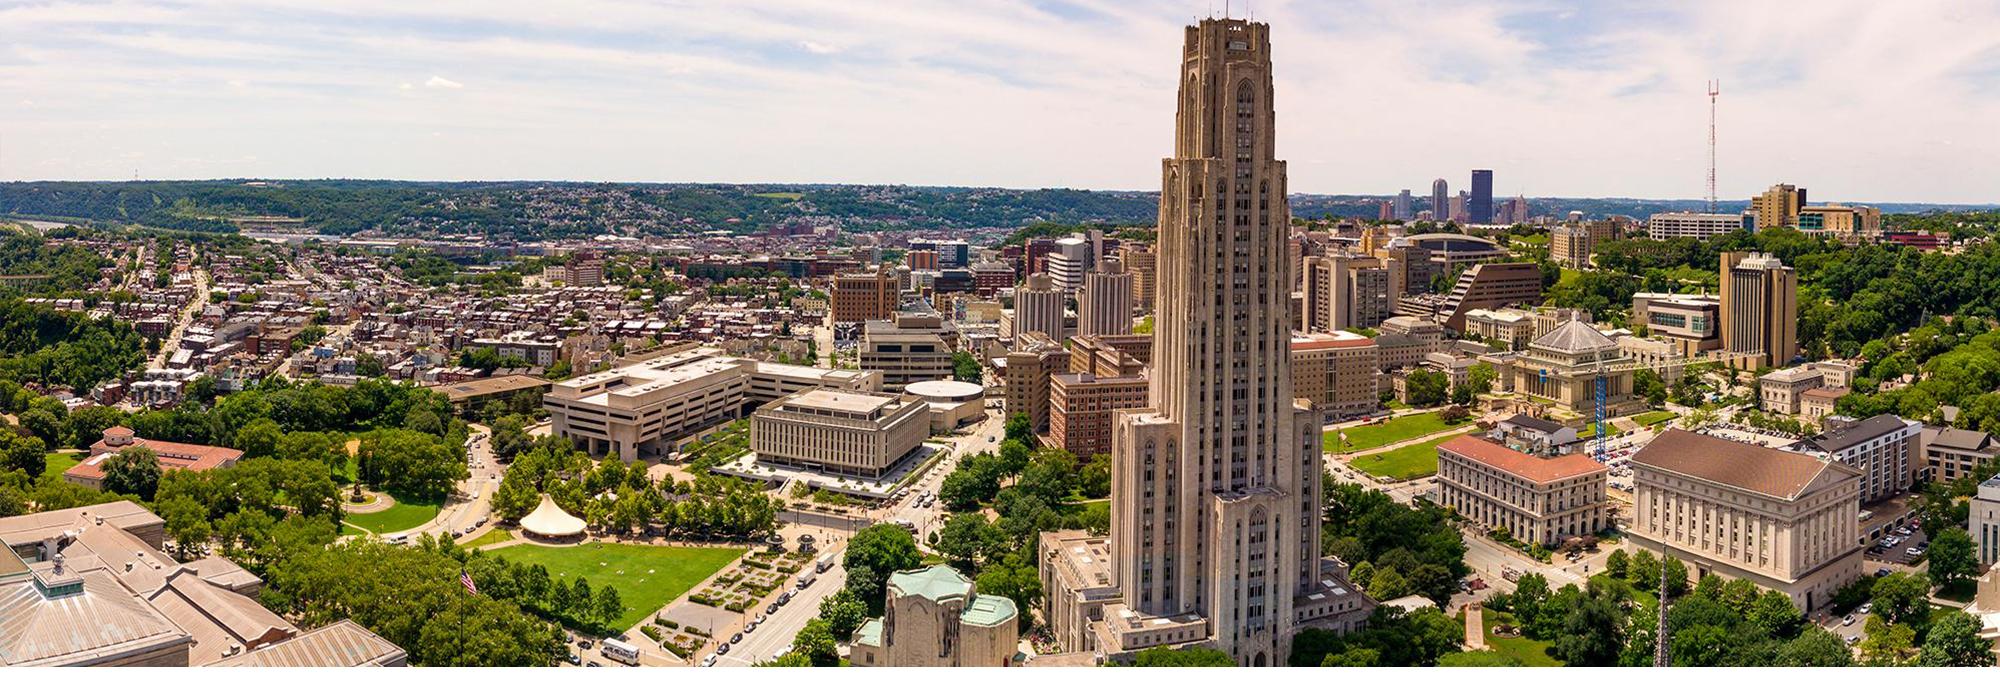 iDesign   News   University of Pittsburgh Partnership